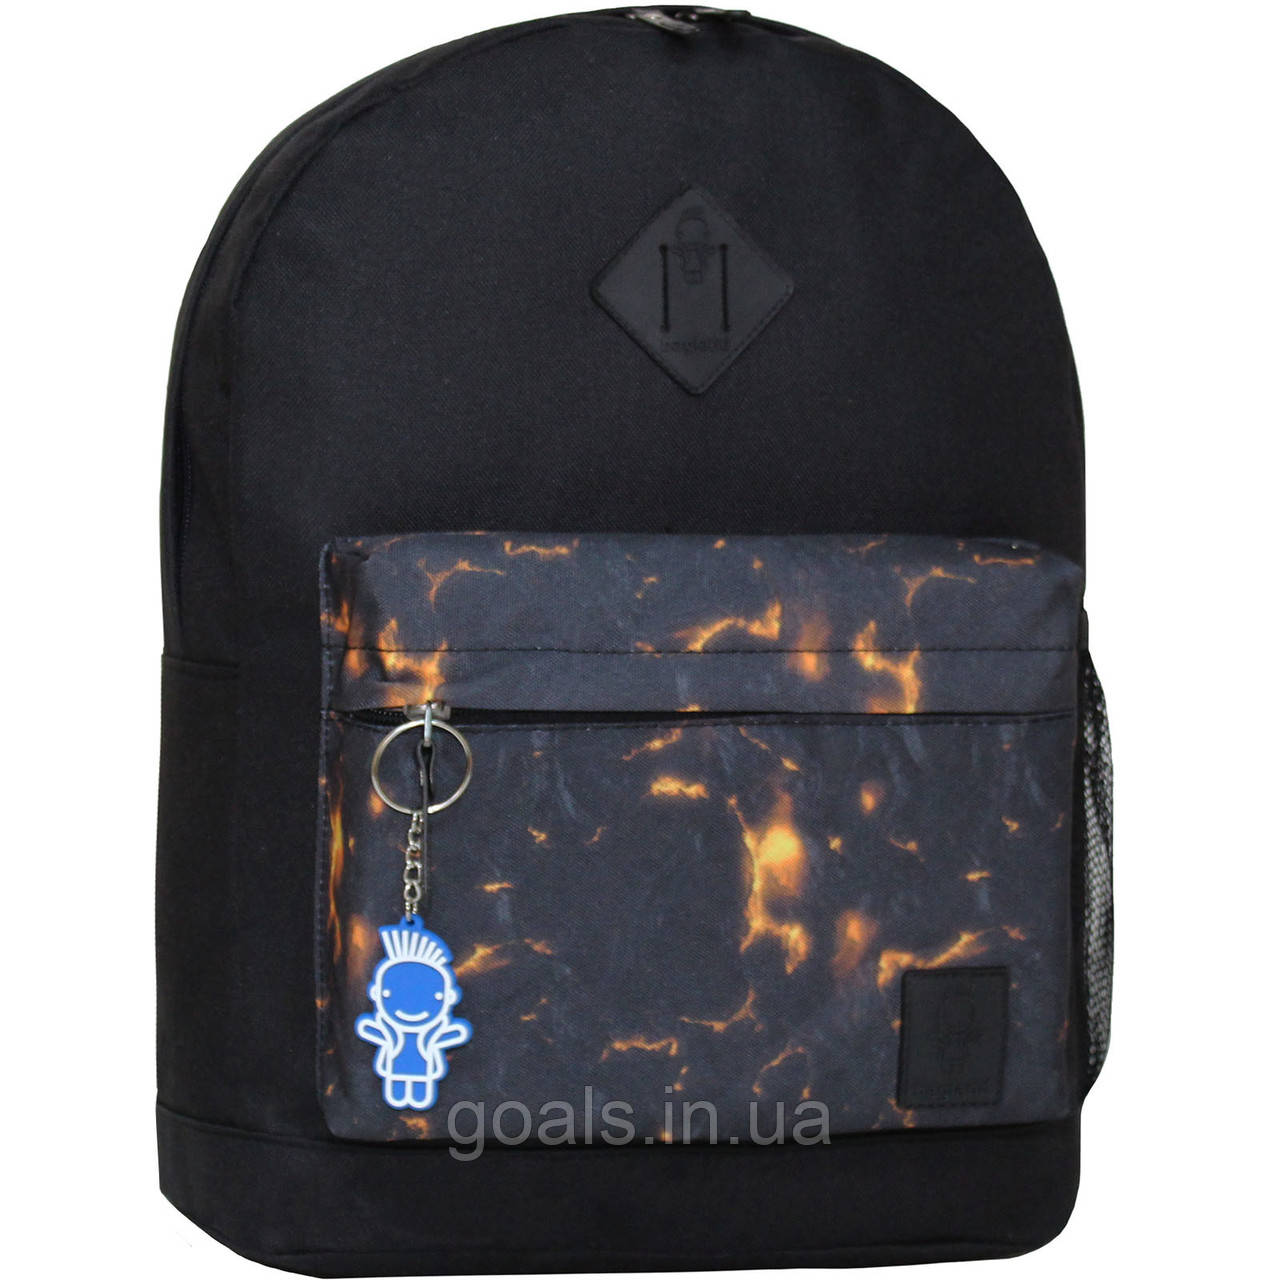 Рюкзак Bagland Молодежный W/R 17 л. чорний 83 (00533662)